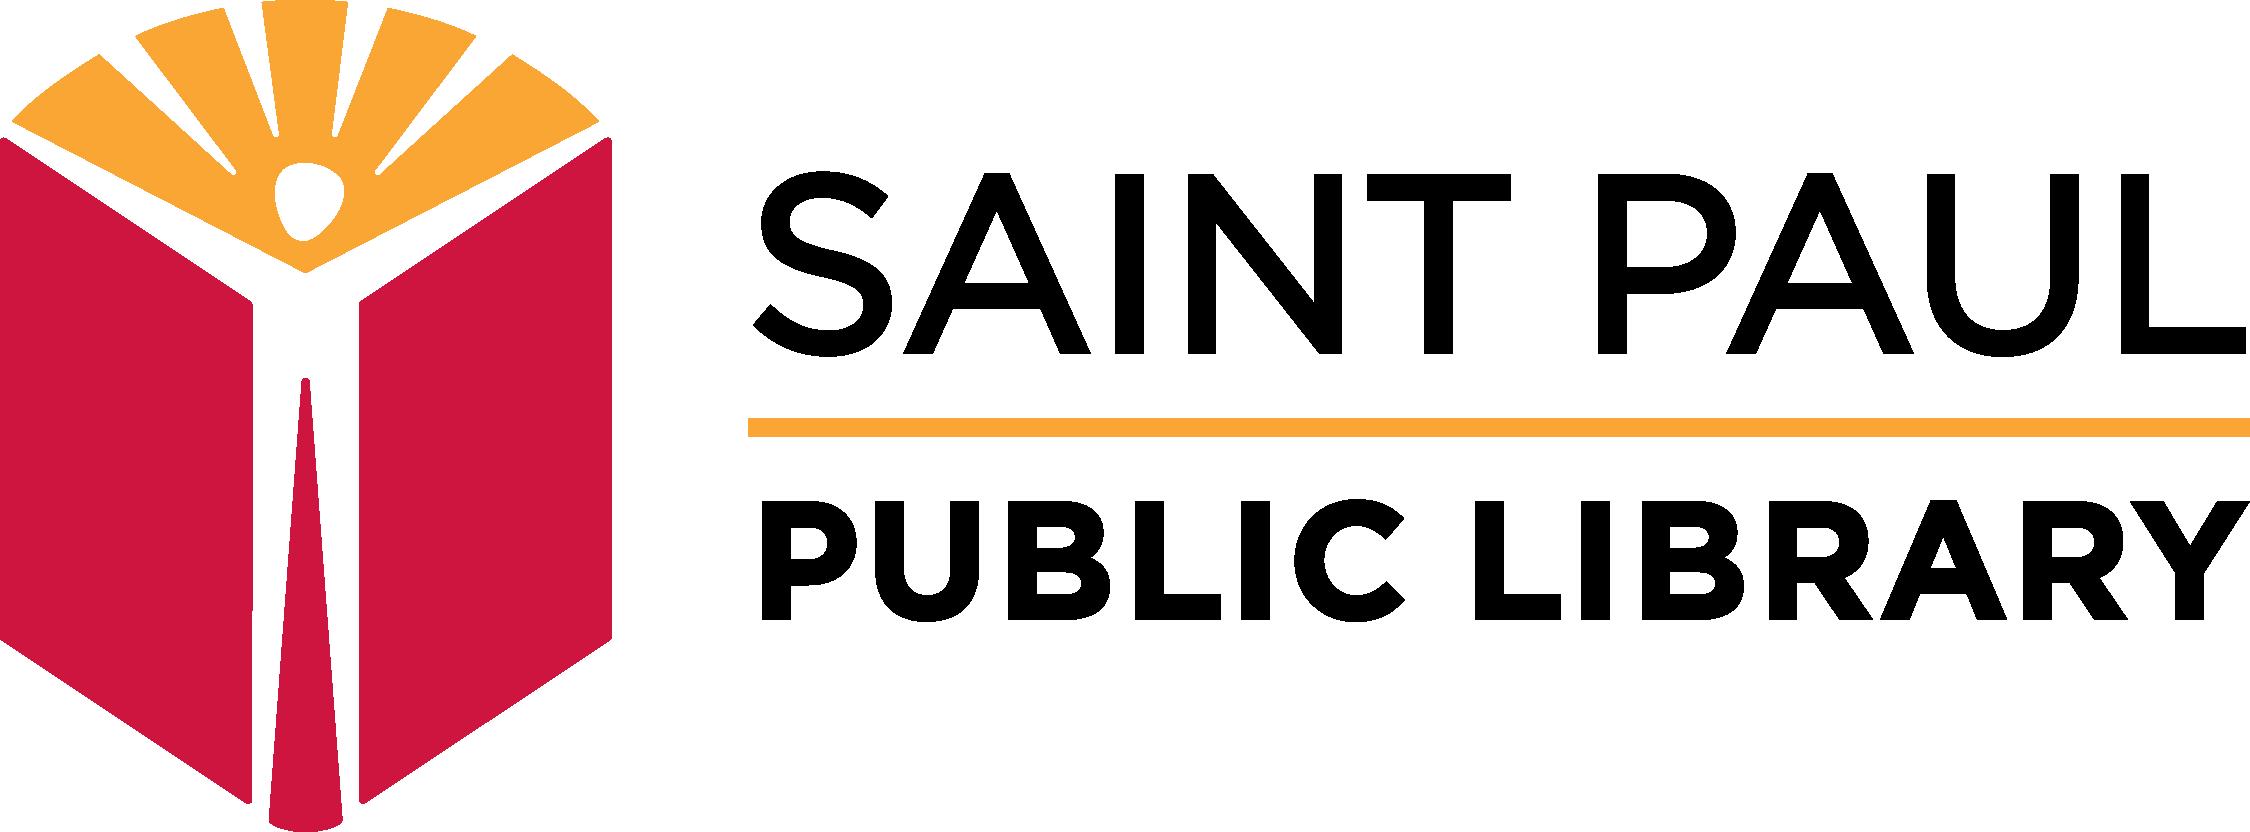 Saint Paul Public Library Logo